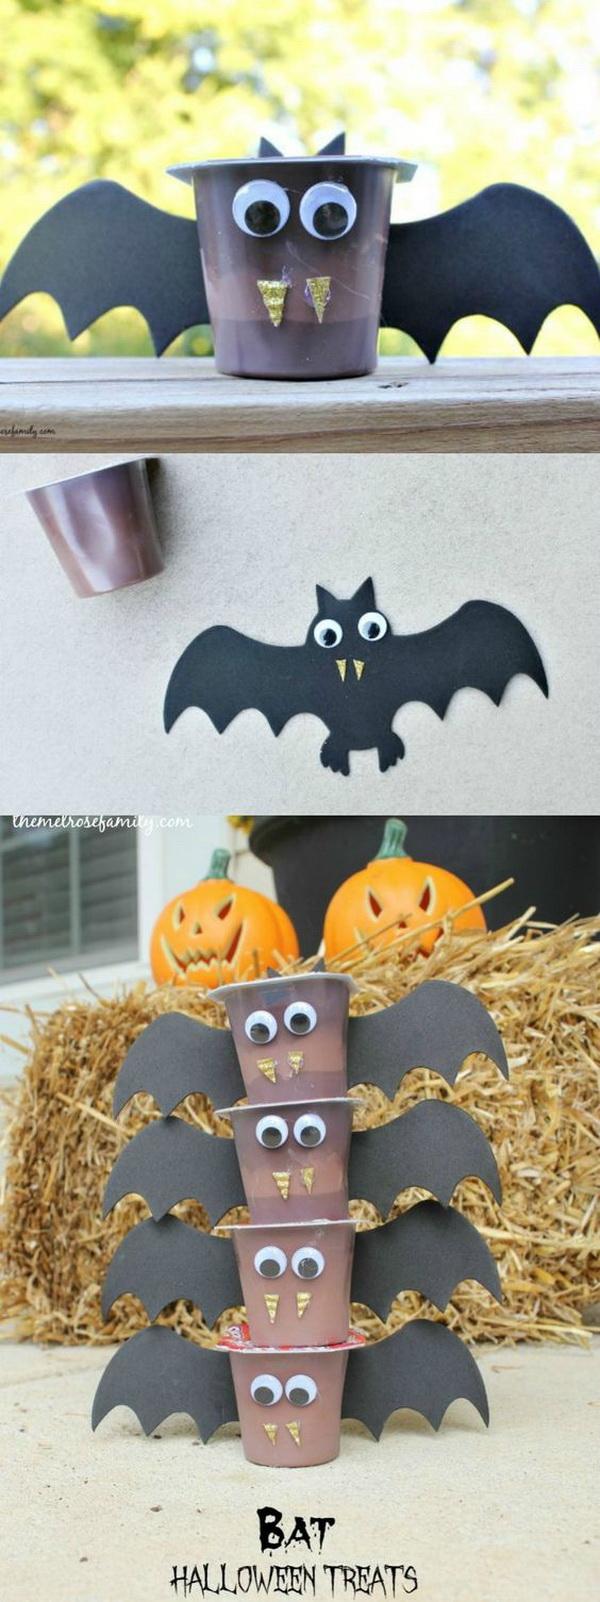 Bat Halloween Treats. An adorable, fun snack idea for kids this Halloween.